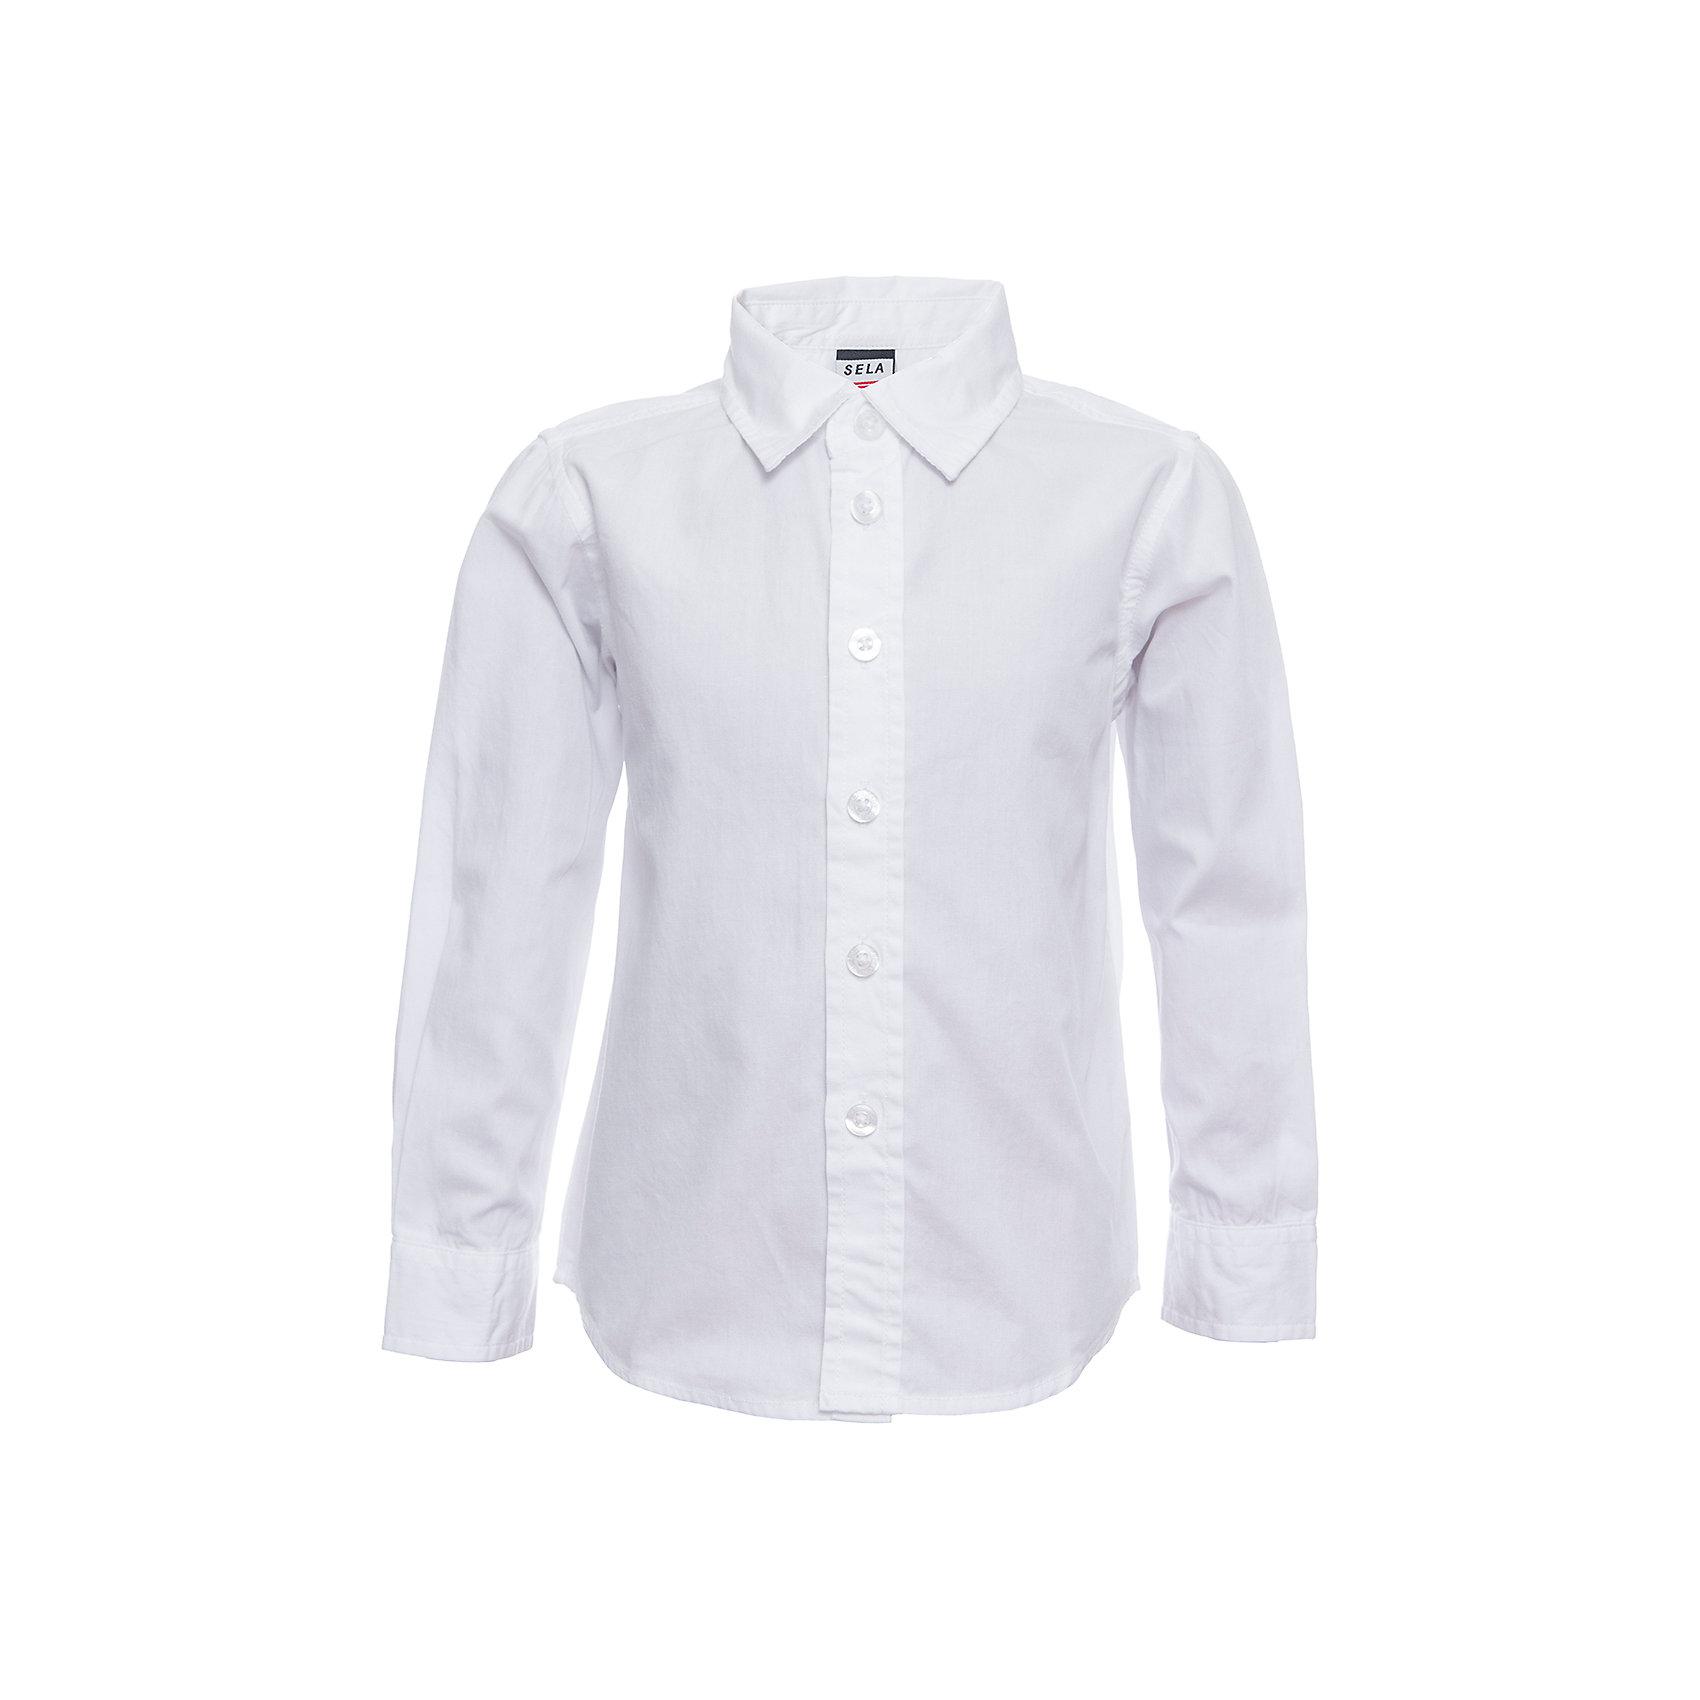 Рубашка SELA для мальчикаБлузки и рубашки<br>Рубашка SELA для мальчика<br>Состав:<br>100% хлопок<br><br>Ширина мм: 174<br>Глубина мм: 10<br>Высота мм: 169<br>Вес г: 157<br>Цвет: белый<br>Возраст от месяцев: 18<br>Возраст до месяцев: 24<br>Пол: Мужской<br>Возраст: Детский<br>Размер: 92,116,110,104,98<br>SKU: 7032317